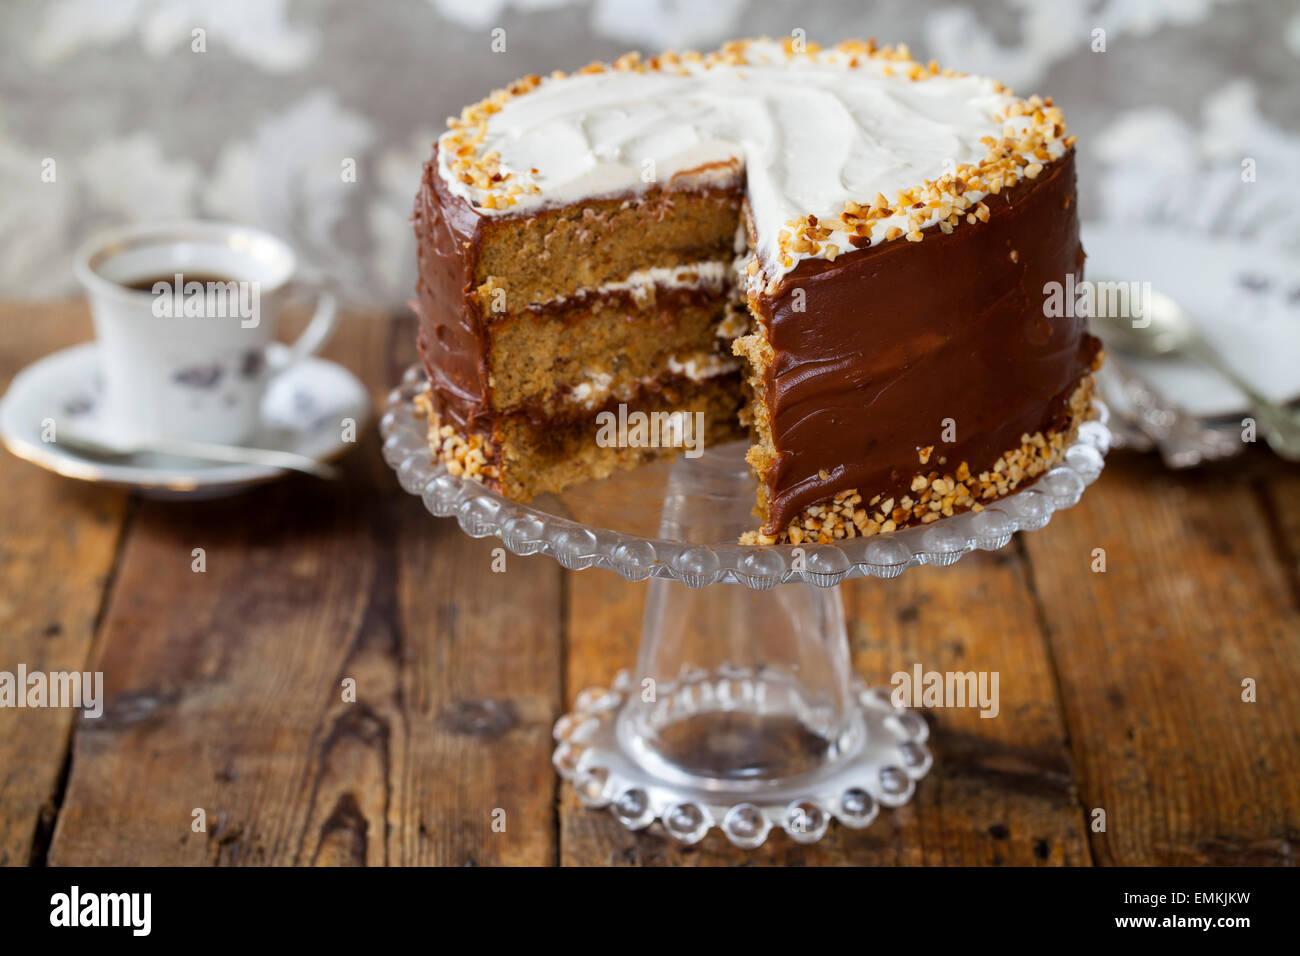 Coffee and hazelnut cake - Stock Image